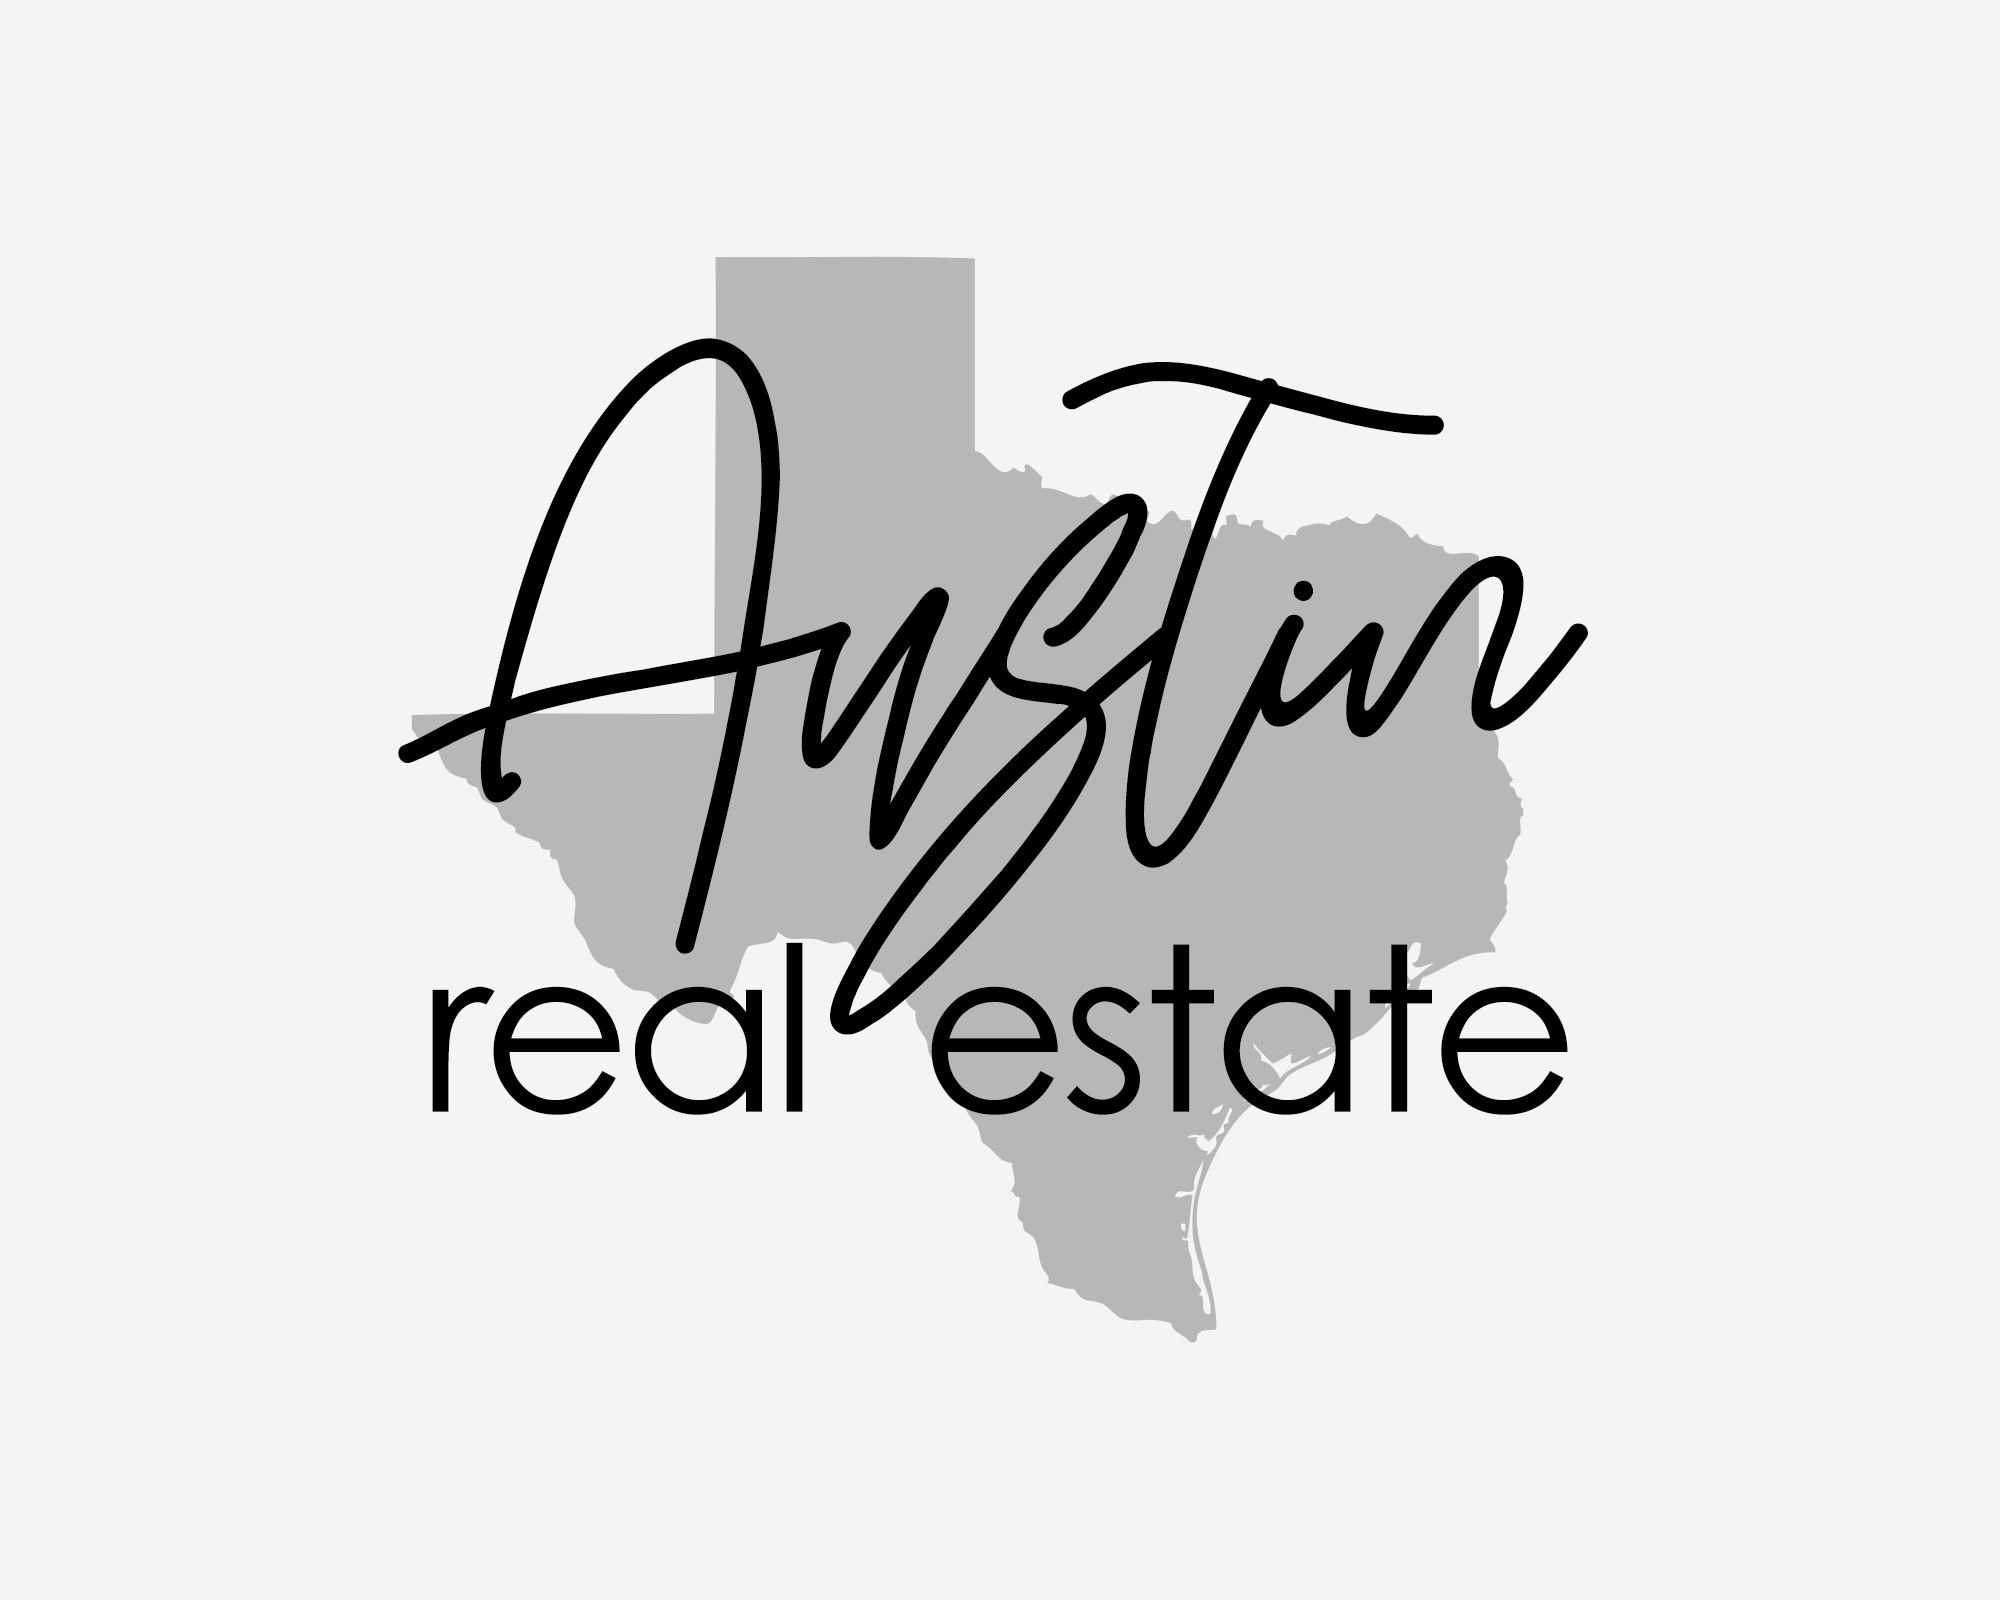 Texas State Logo Simple Minimalist Logo Fashion Boutique Logo Realtor Boutique Log Fashion Show Poster Fashion Editorial Couple Fashion Blogger Instagram